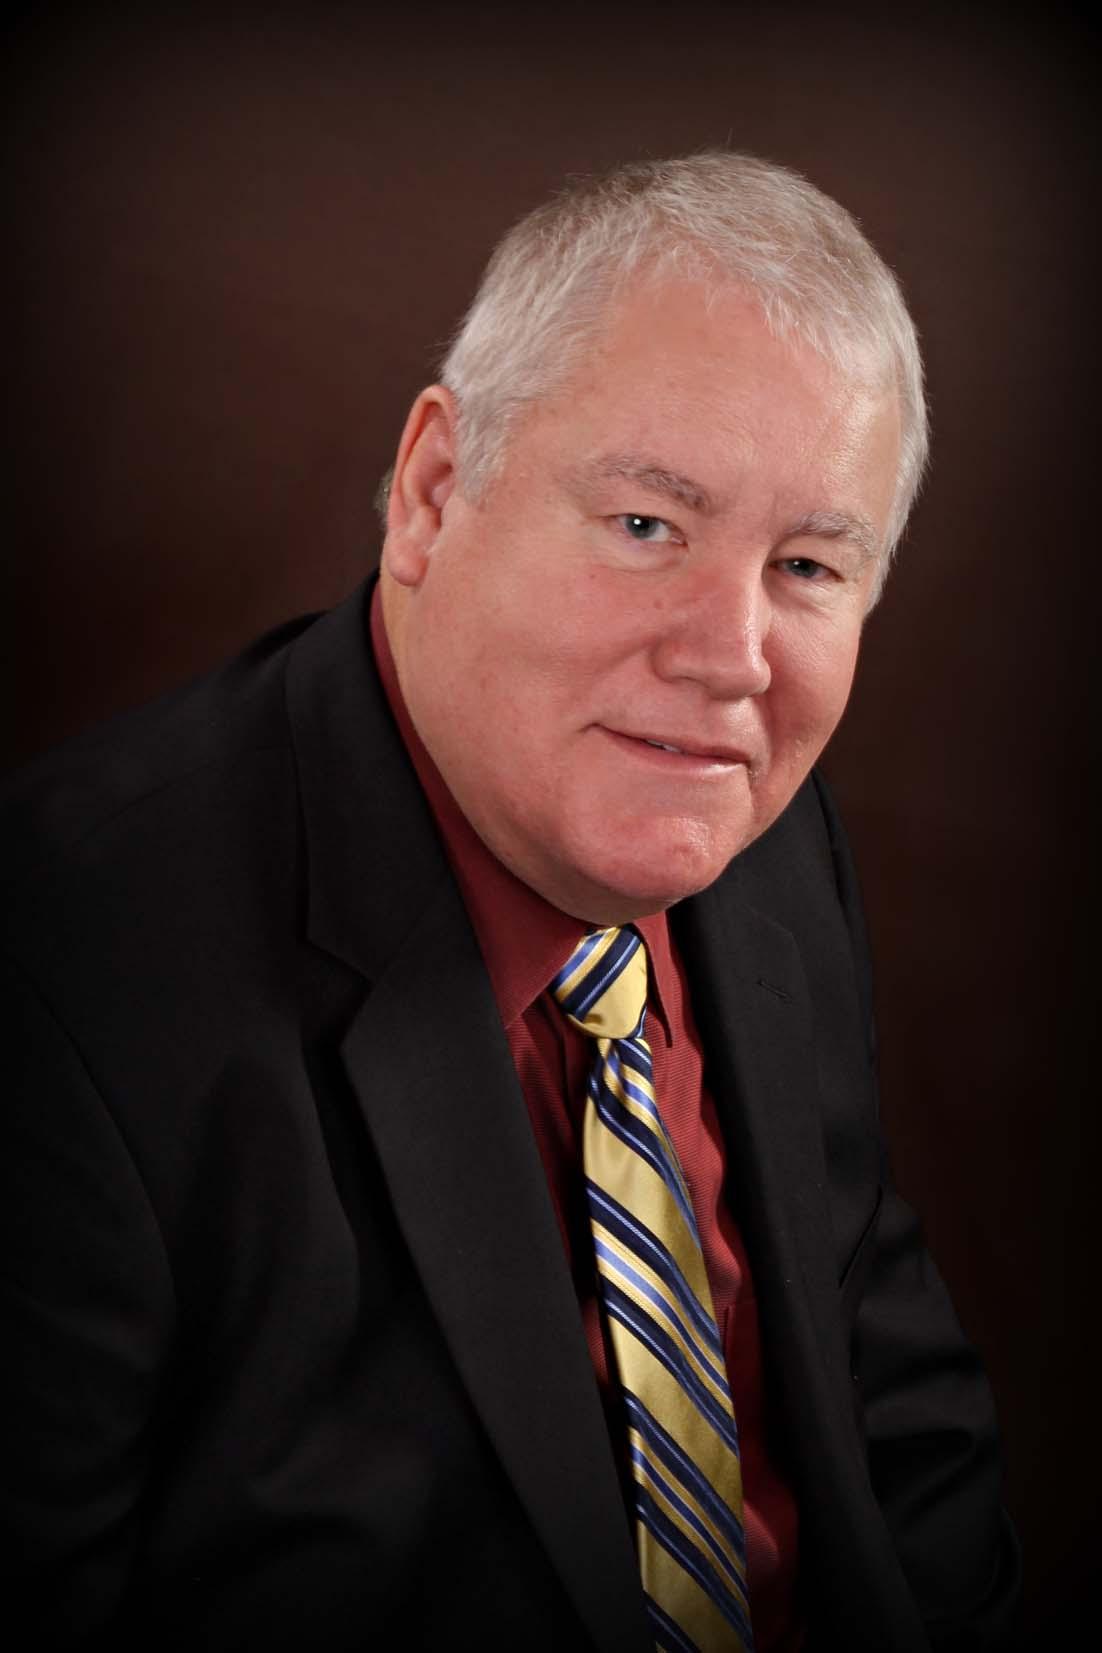 Allen Krom, ACD Learning Solutions